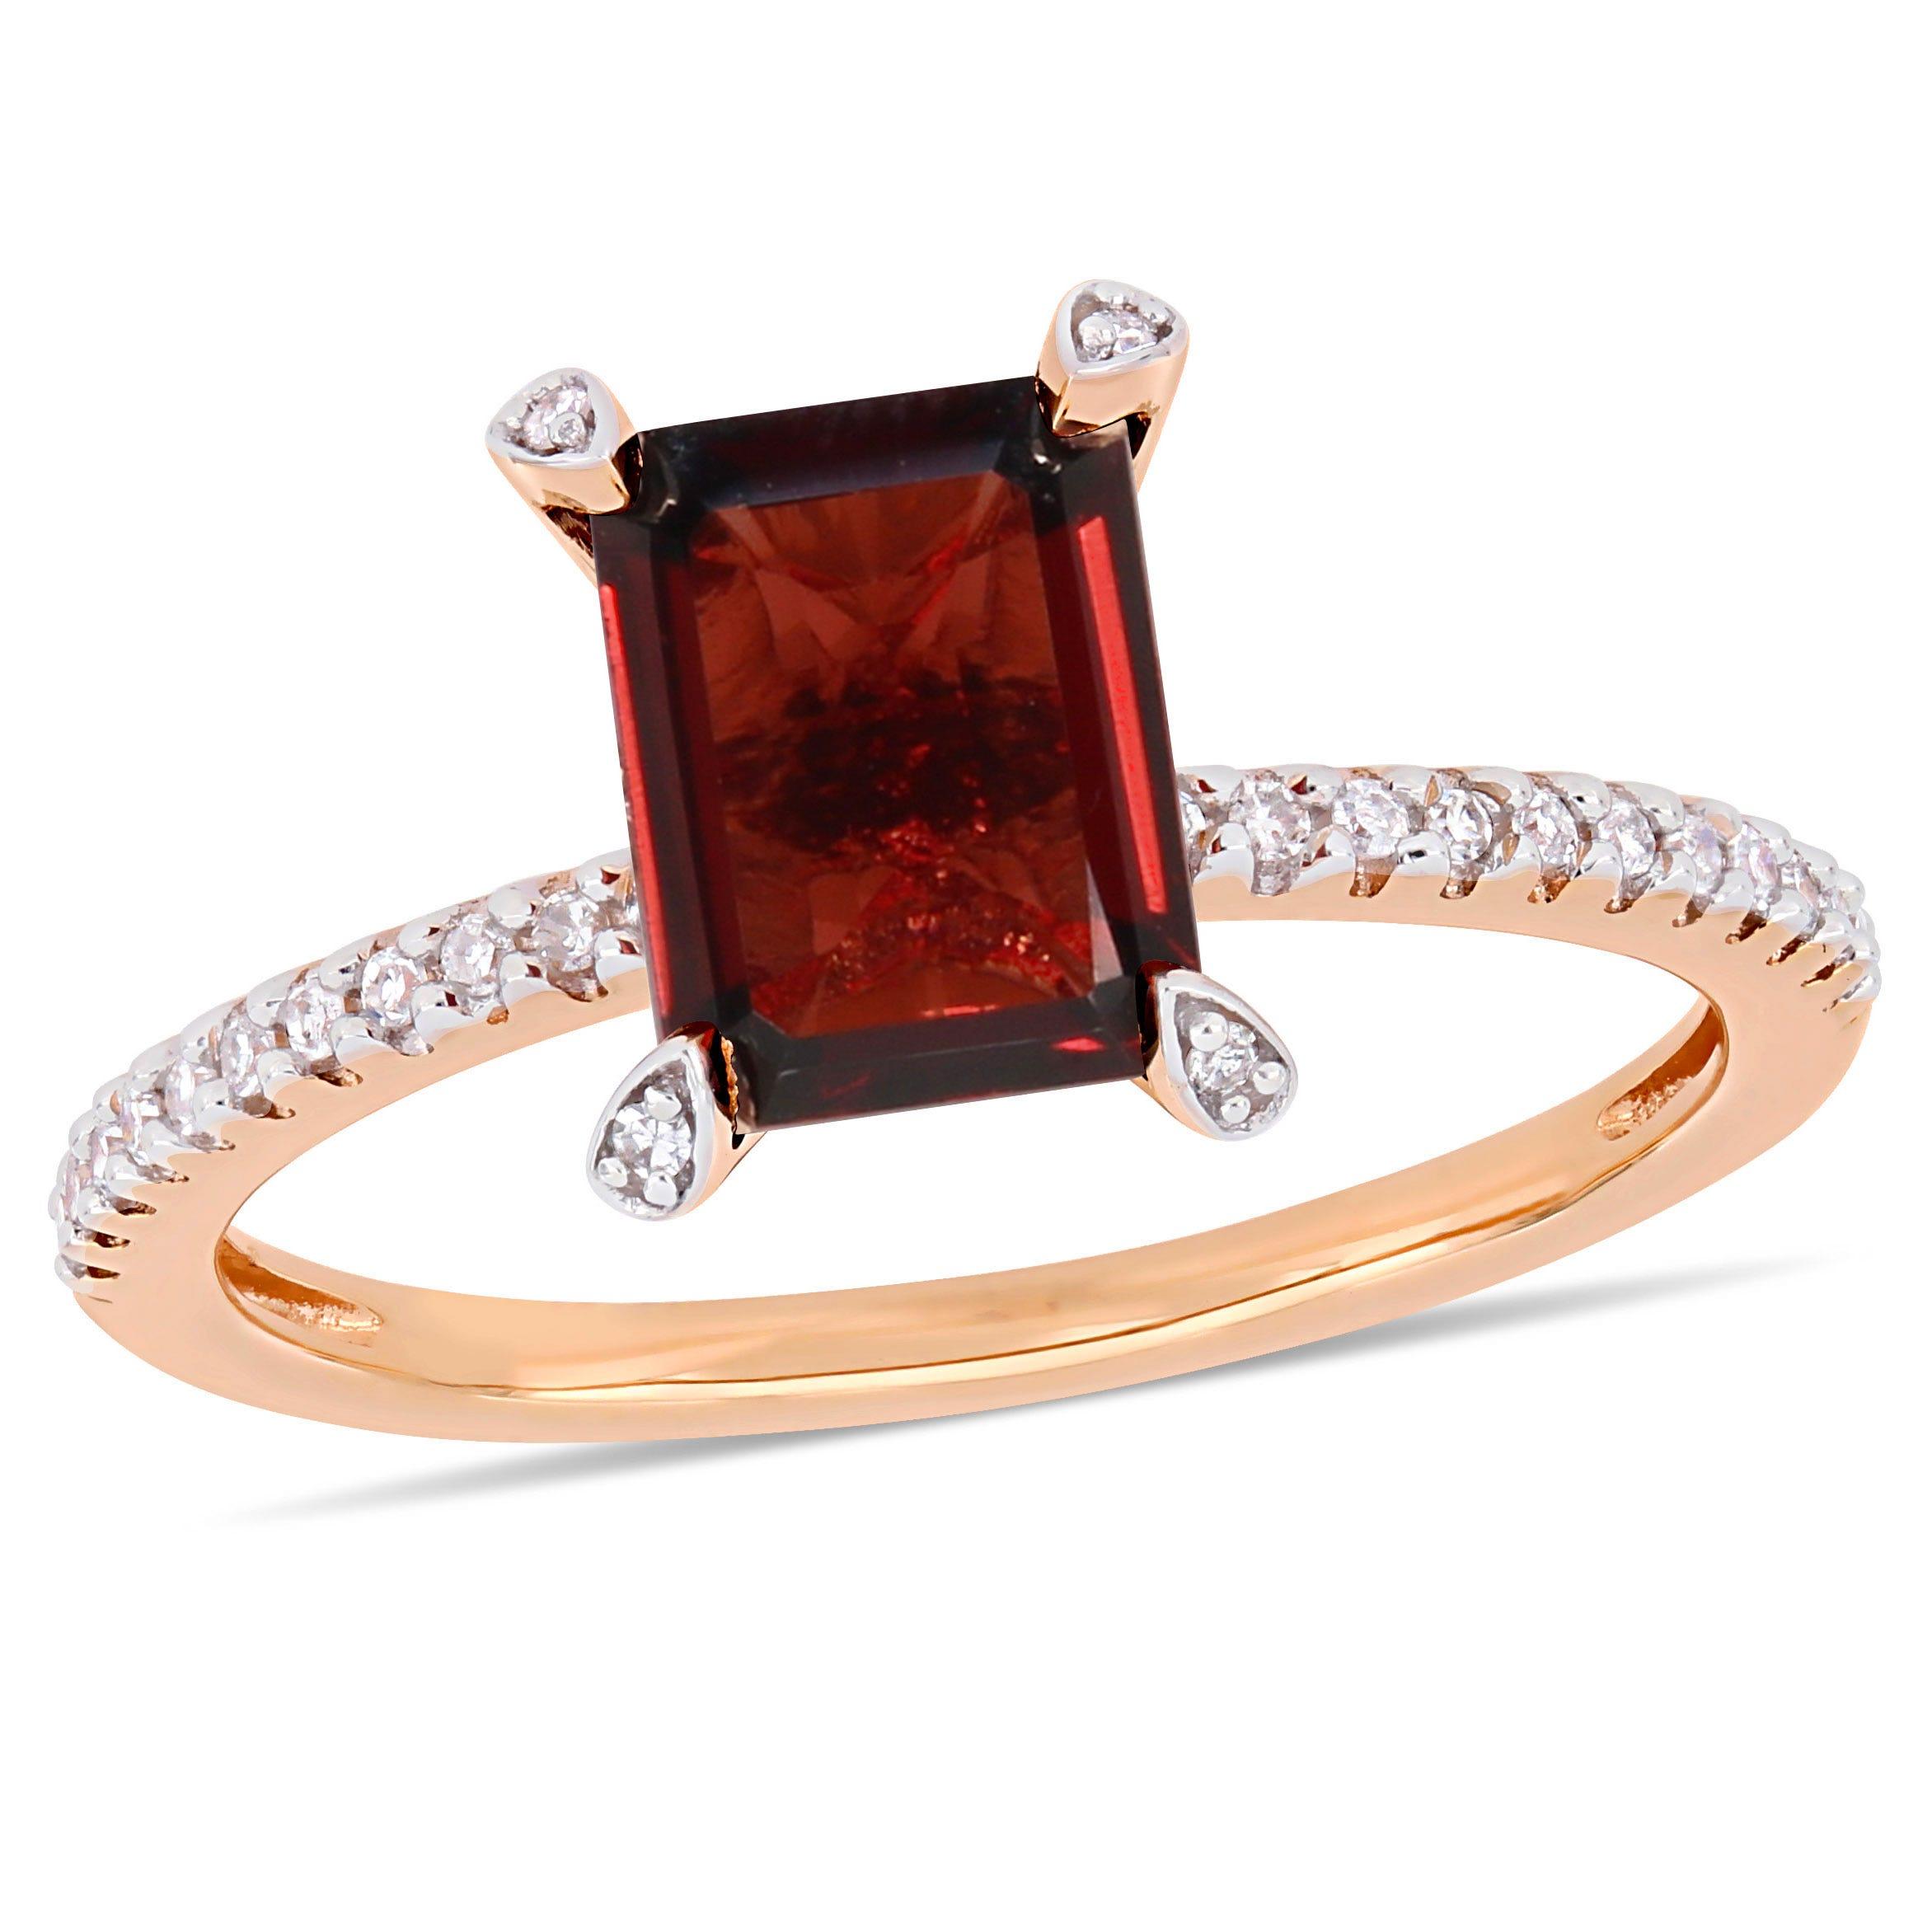 Emerald-Cut Garnet Engagement Ring in 10k Rose Gold